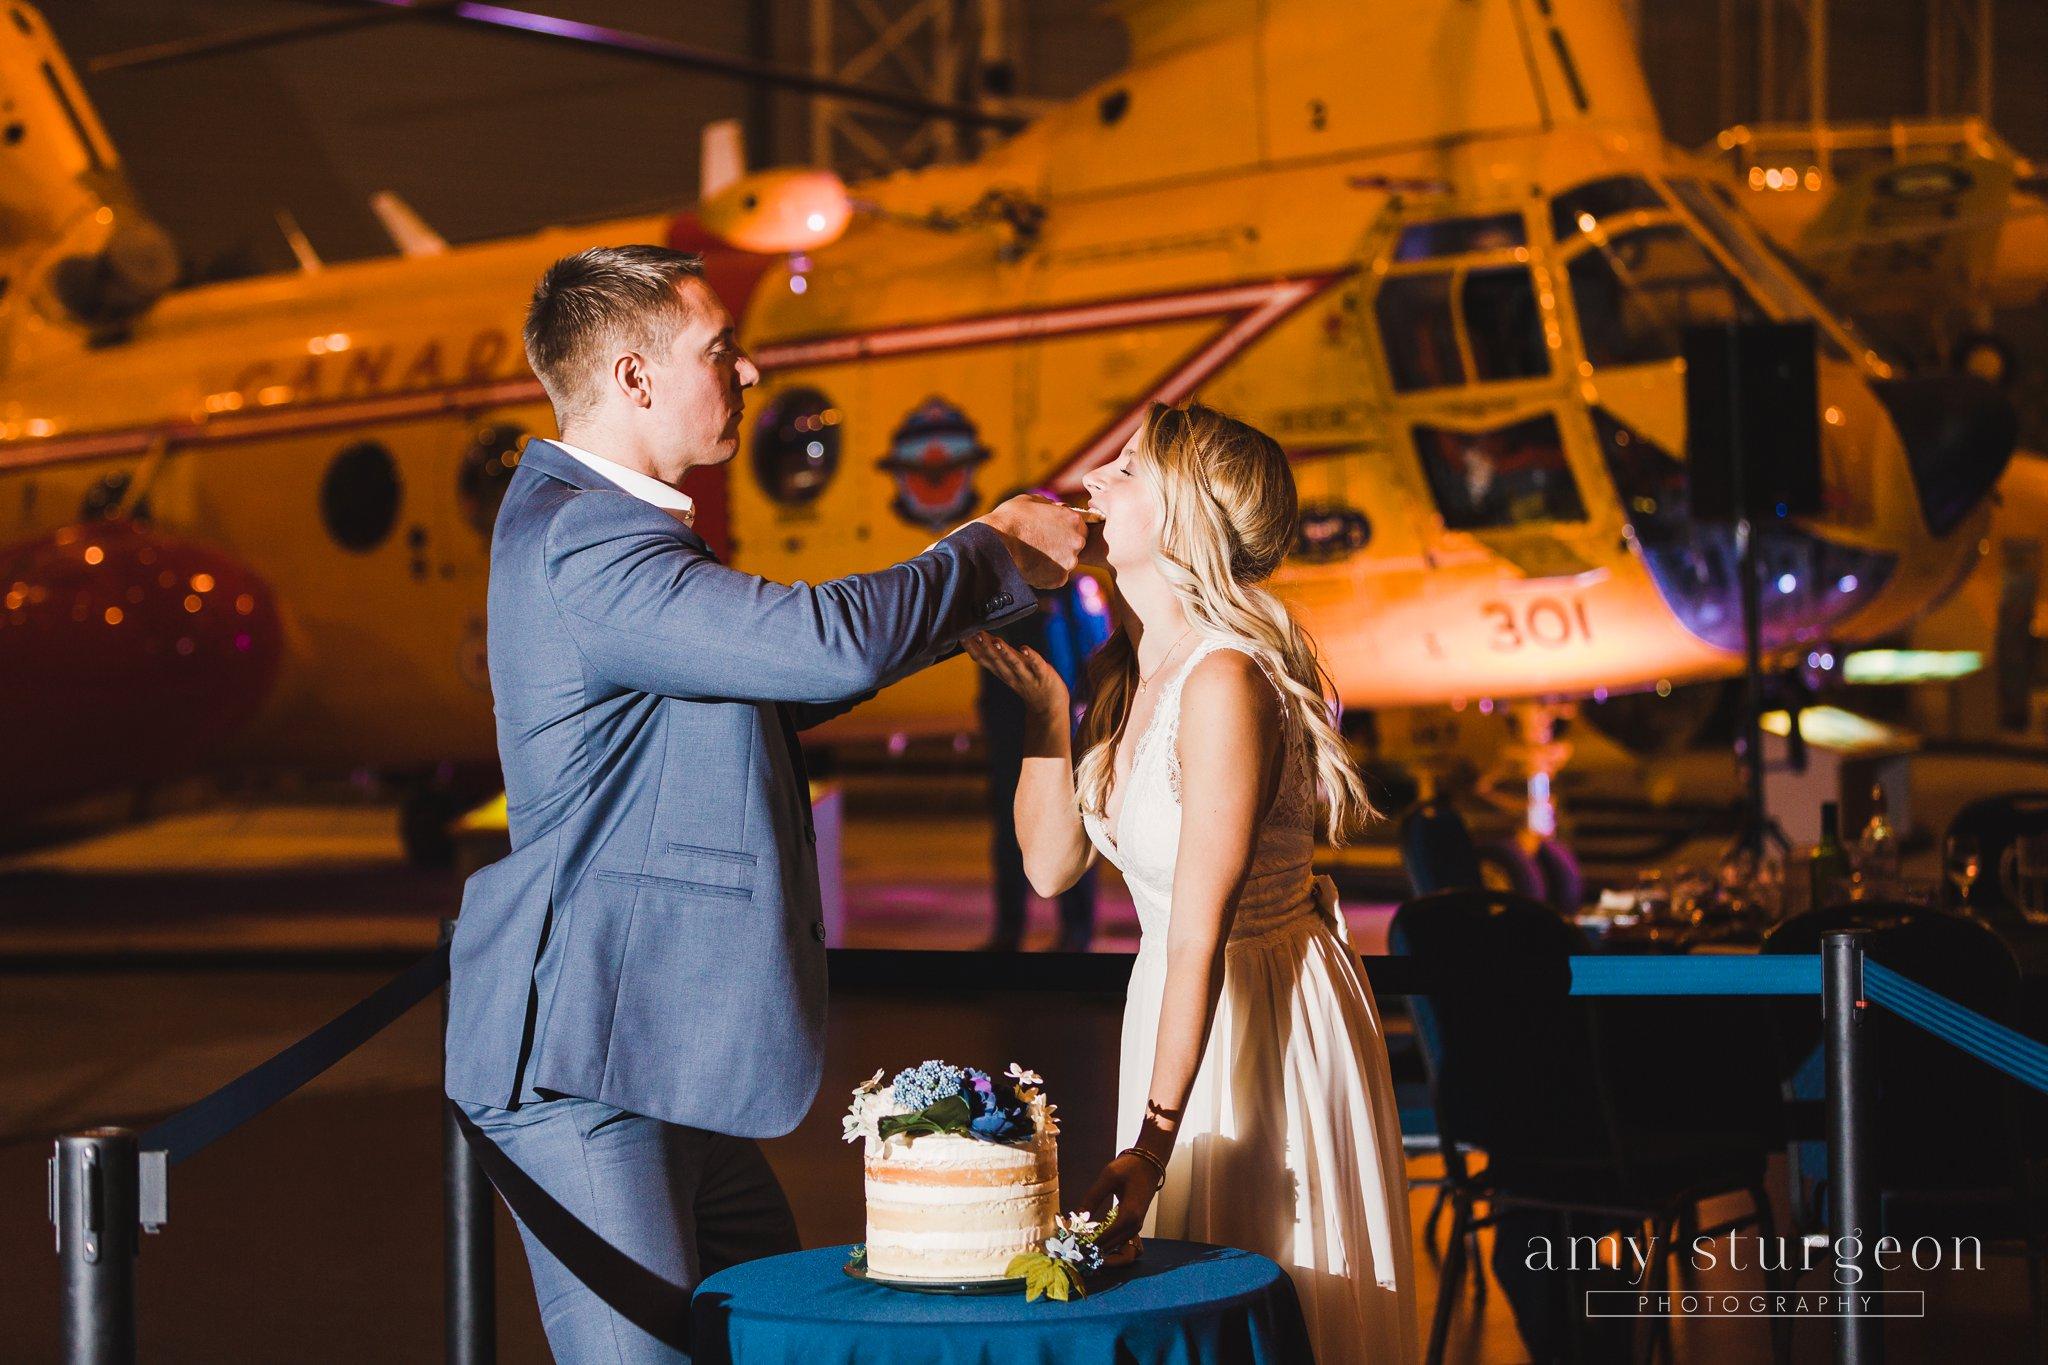 amy-sturgeon-photography_canadian-aviation-museum-wedding_0105